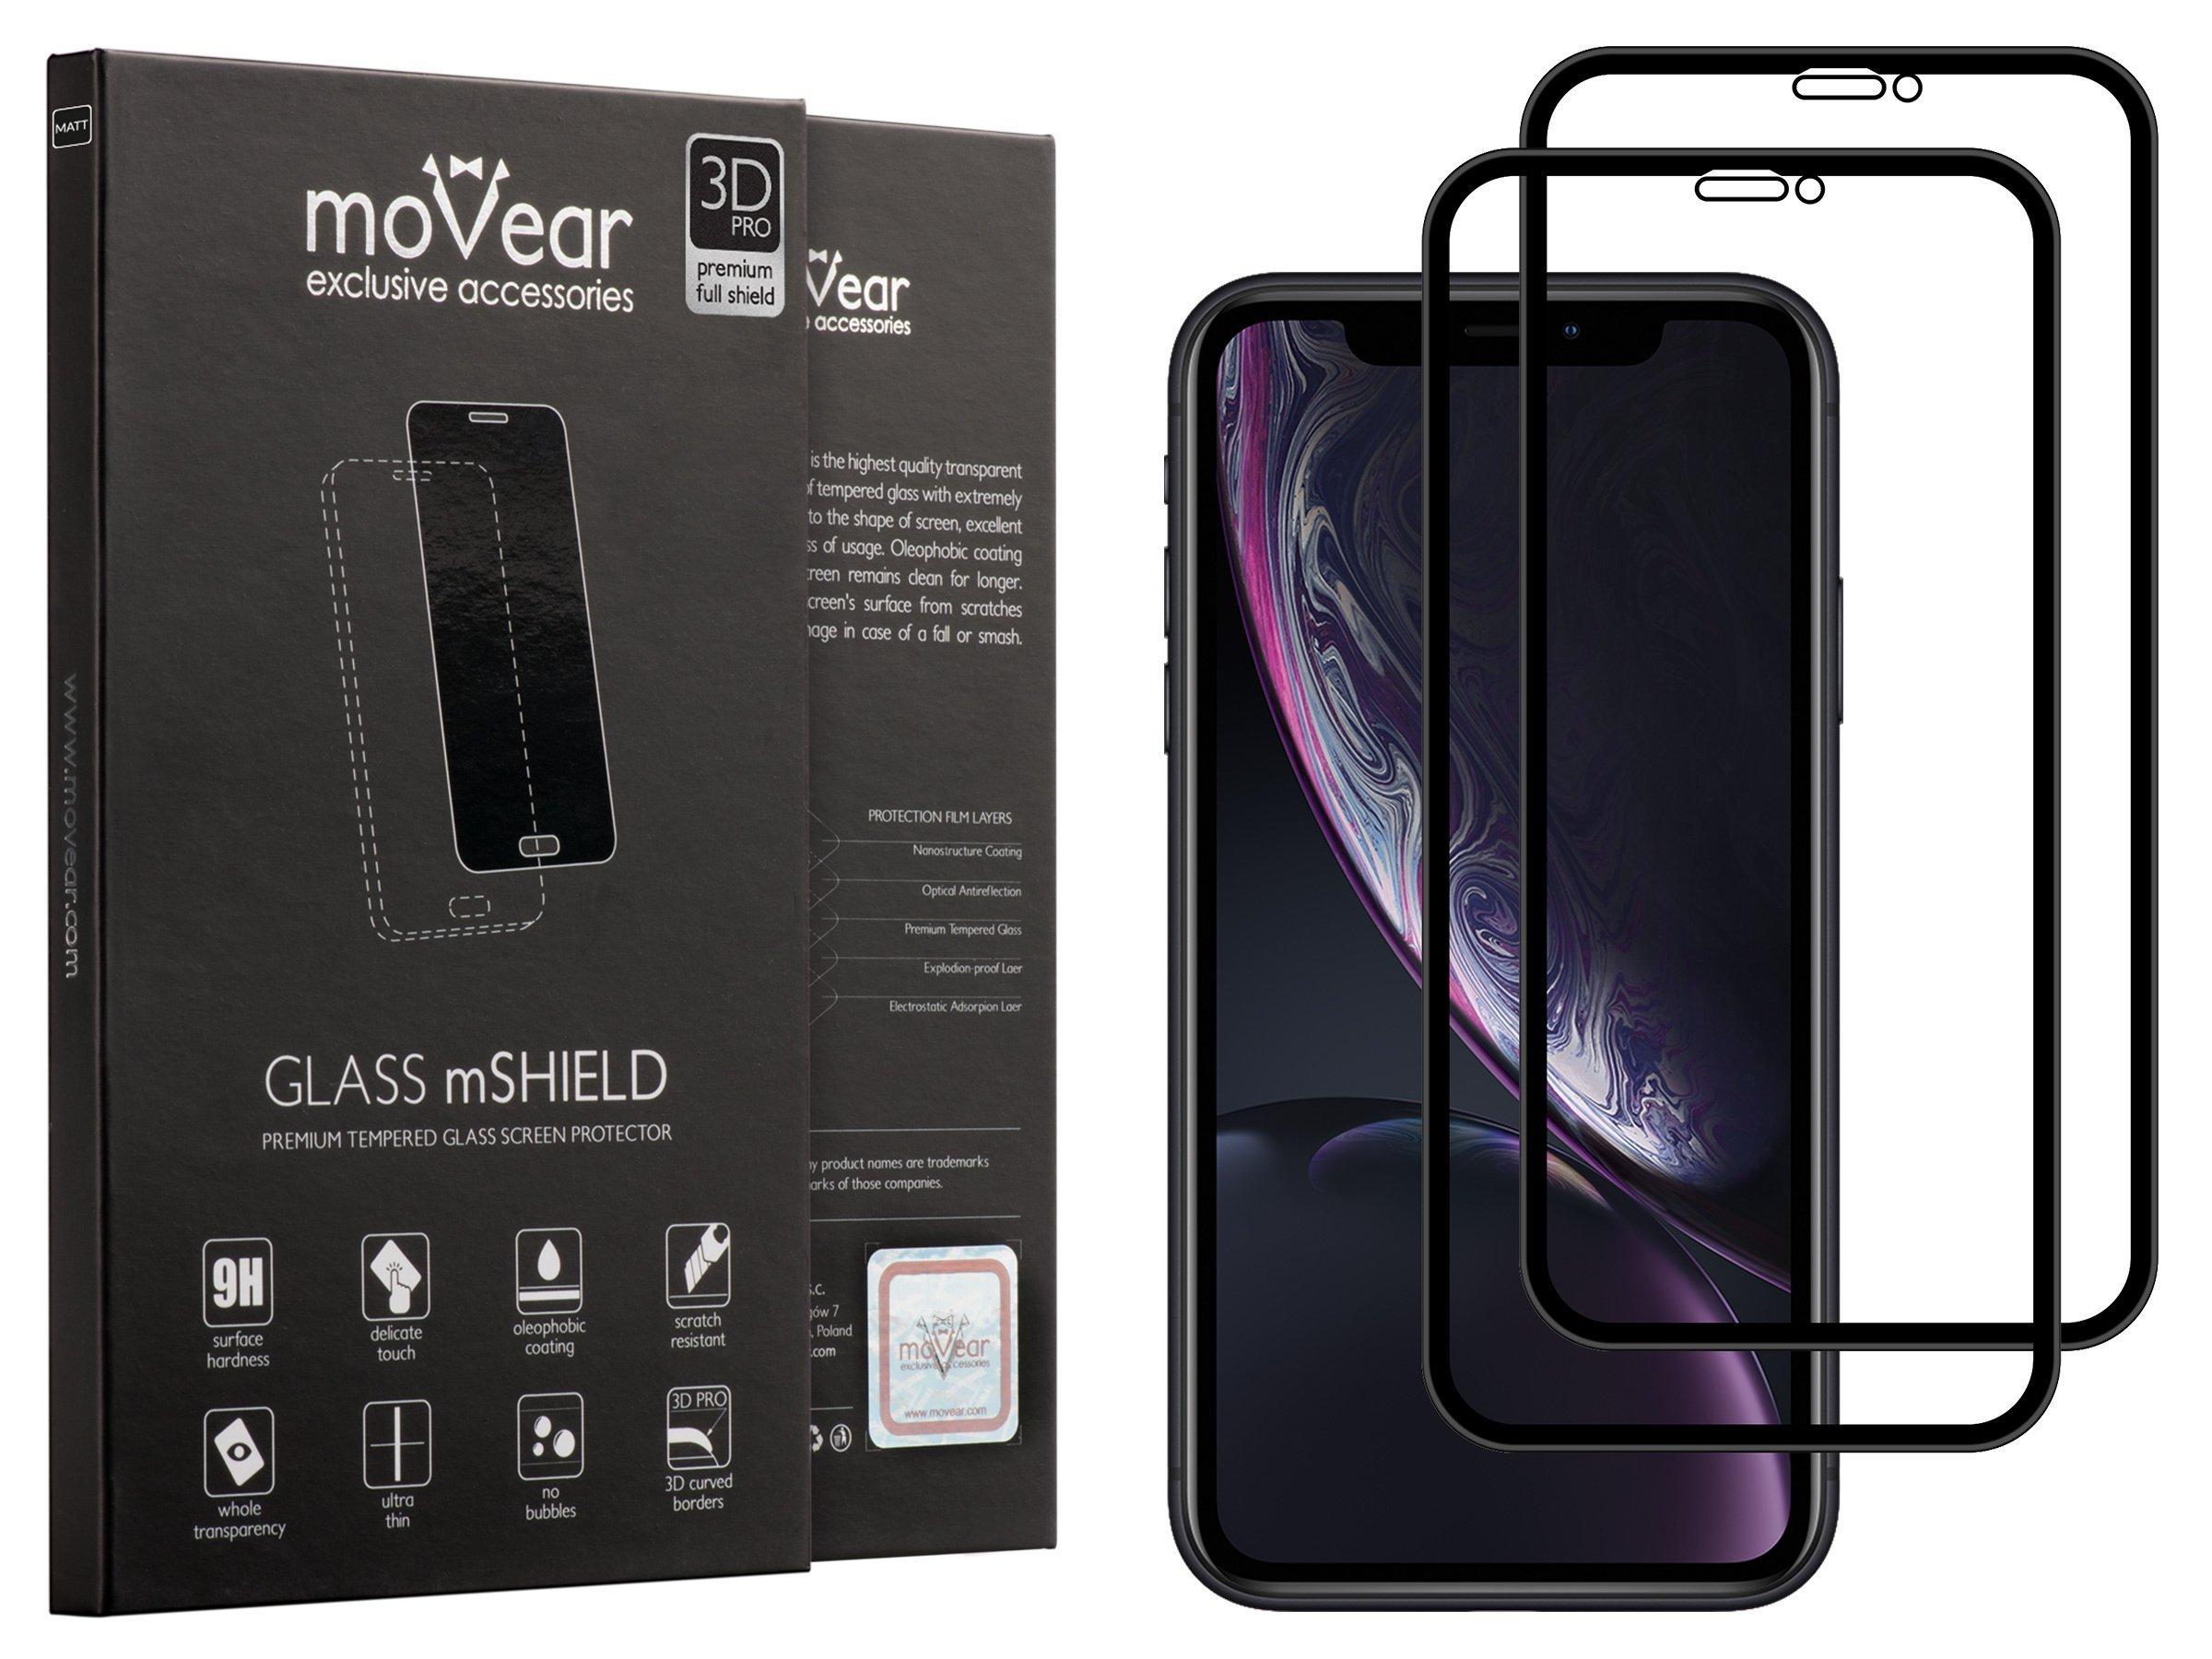 2 szt. | moVear Matowe Szkło Hartowane 3D PRO MATT na Apple iPhone Xr | na Cały Ekran, Antyrefleksyjne, 9H | GLASS mSHIELD Czarny